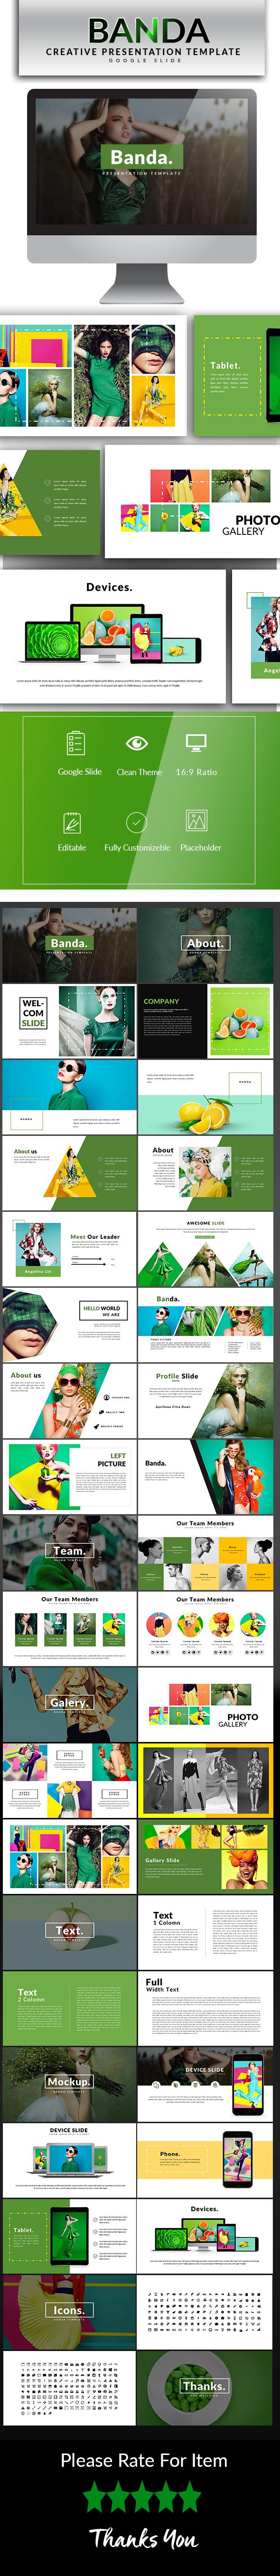 Banda Google Slide Template - Google Slides Presentation Templates